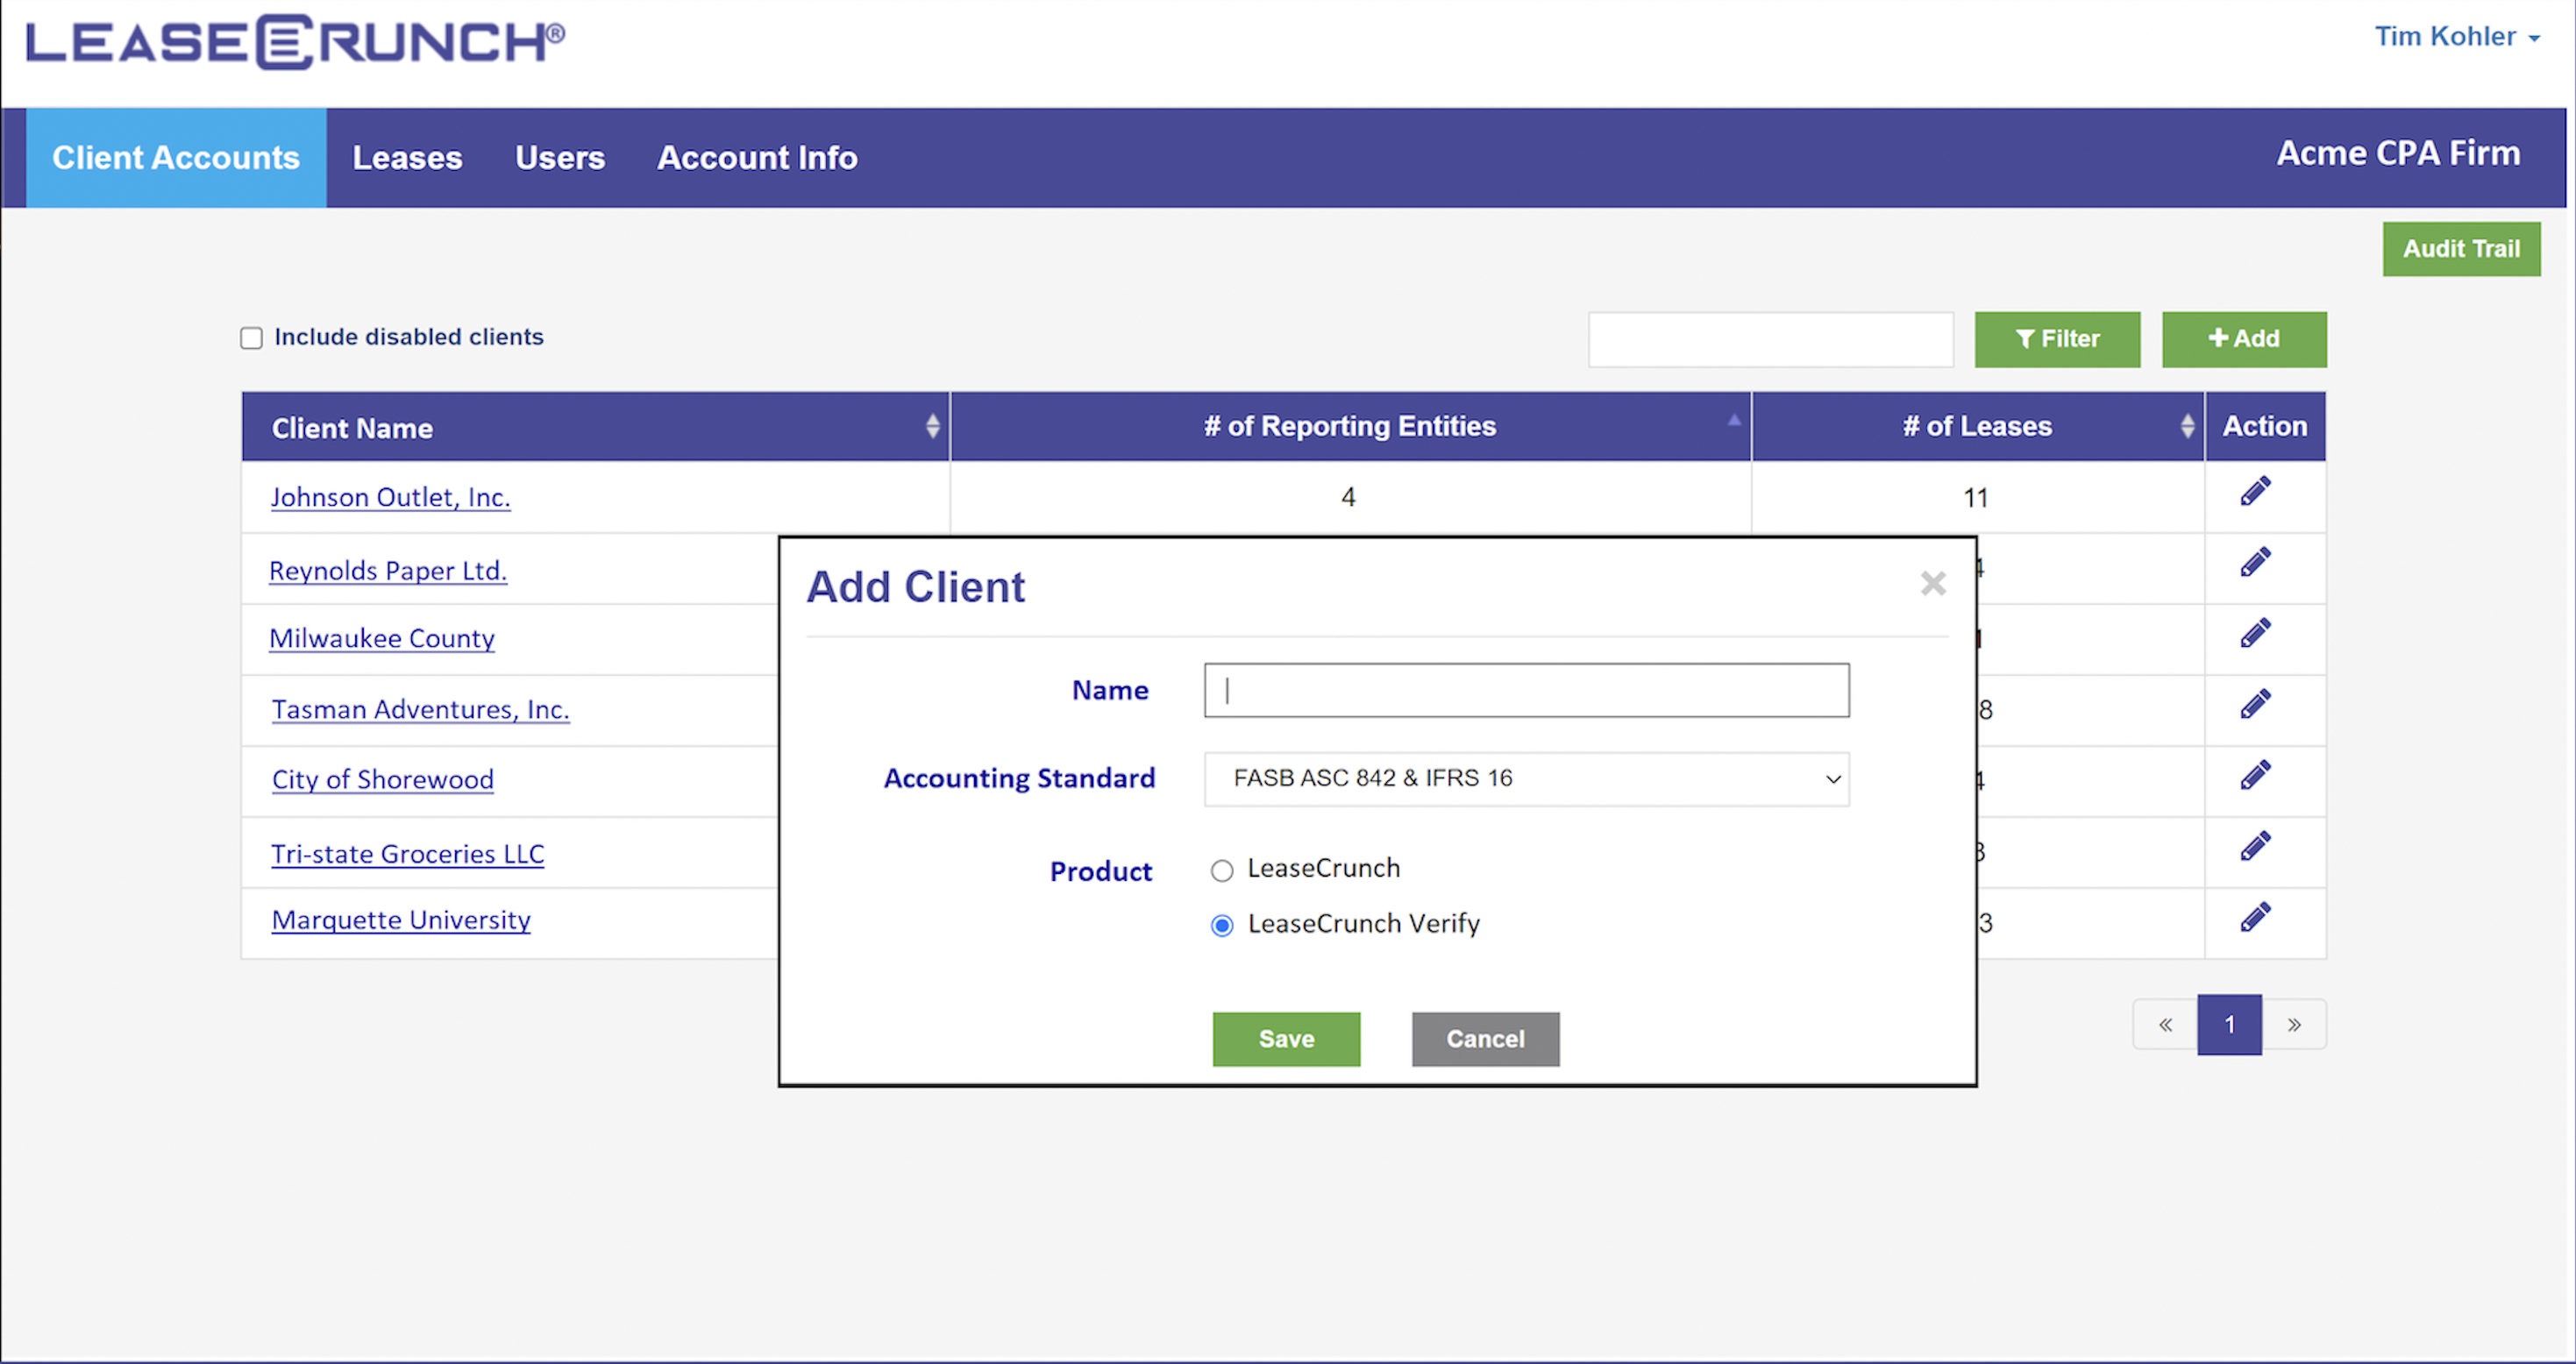 Client Account Tab